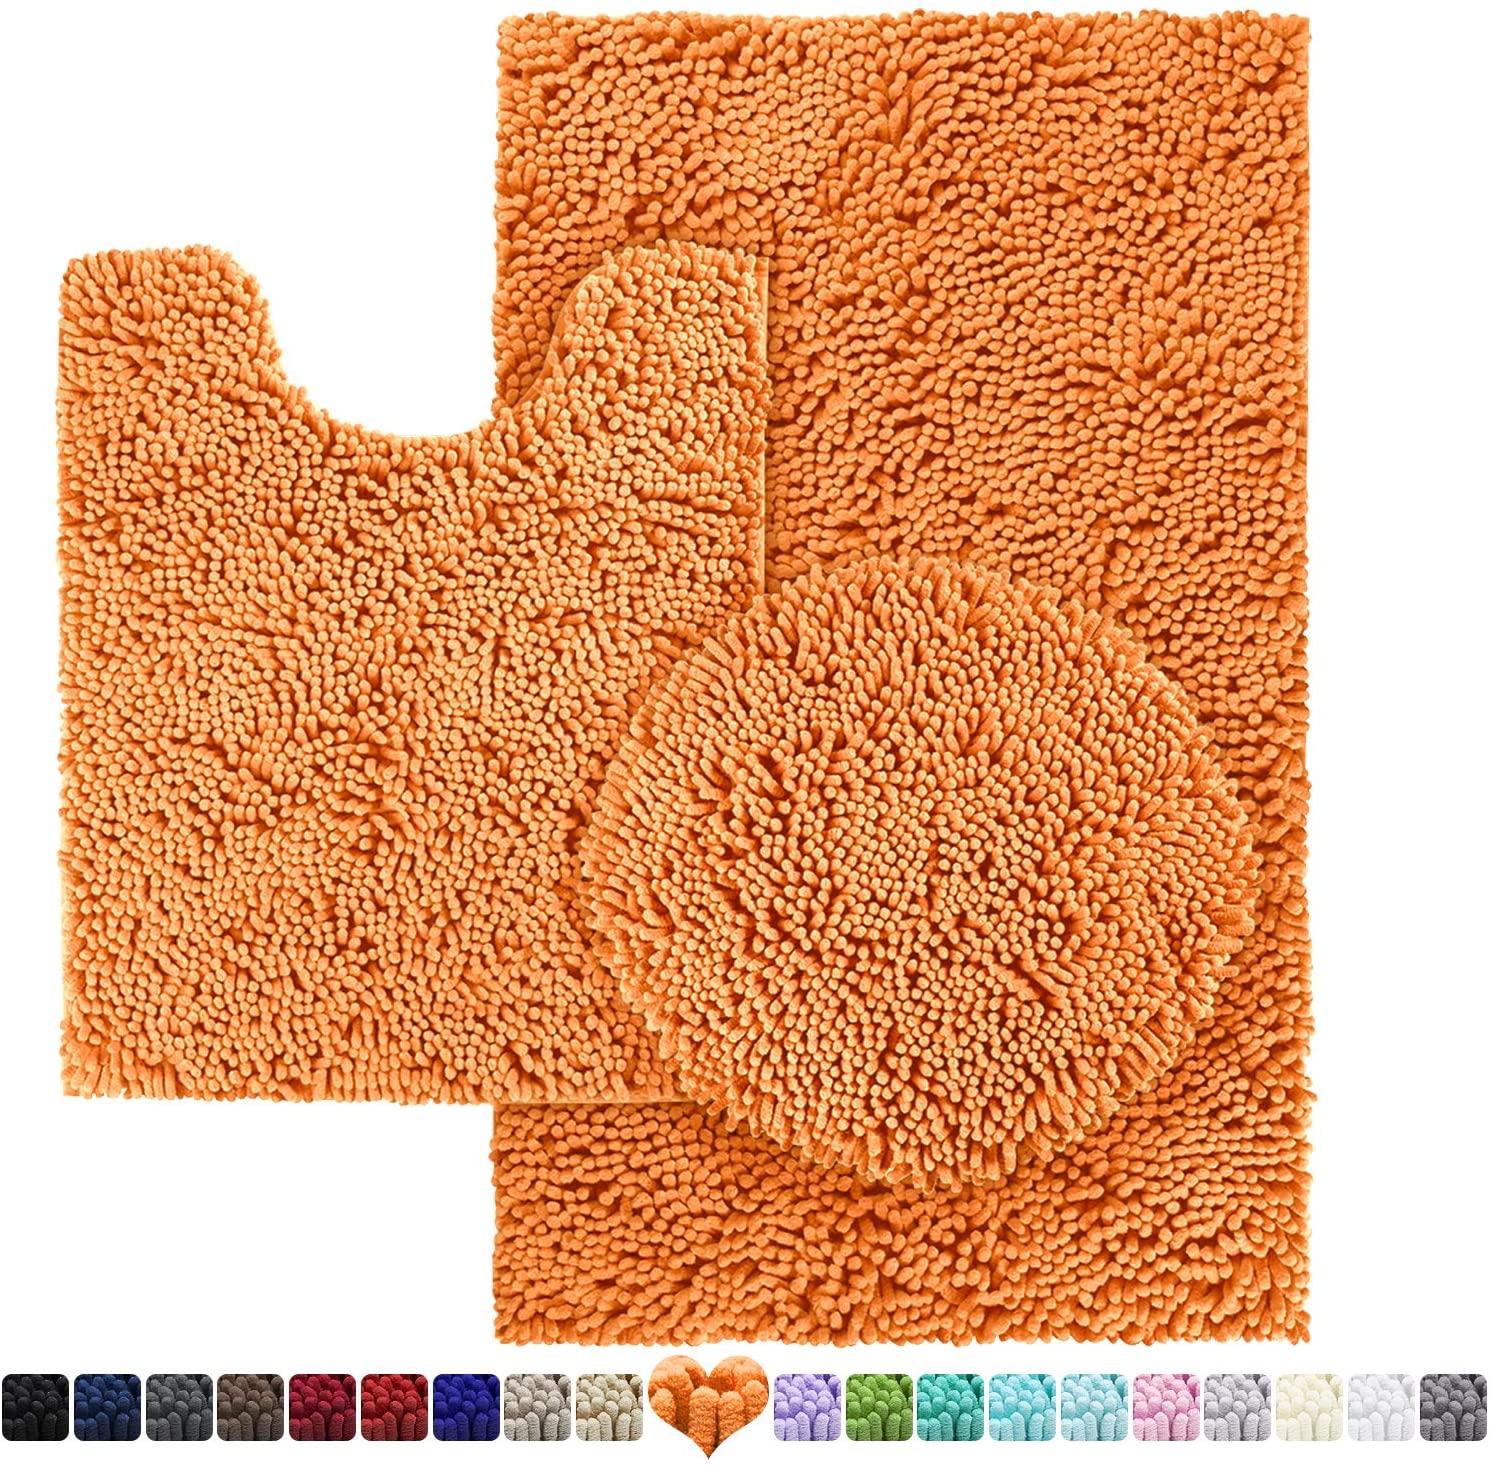 HOMEIDEAS 3 Pieces Bathroom Rugs Set Orange, Includes U-Shaped Contour Toilet Mat, Bath Mat and Shaggy Toilet Lid Cover, Machine Washable & Non Slip Bath Rugs for Bathroom, Tub, Shower